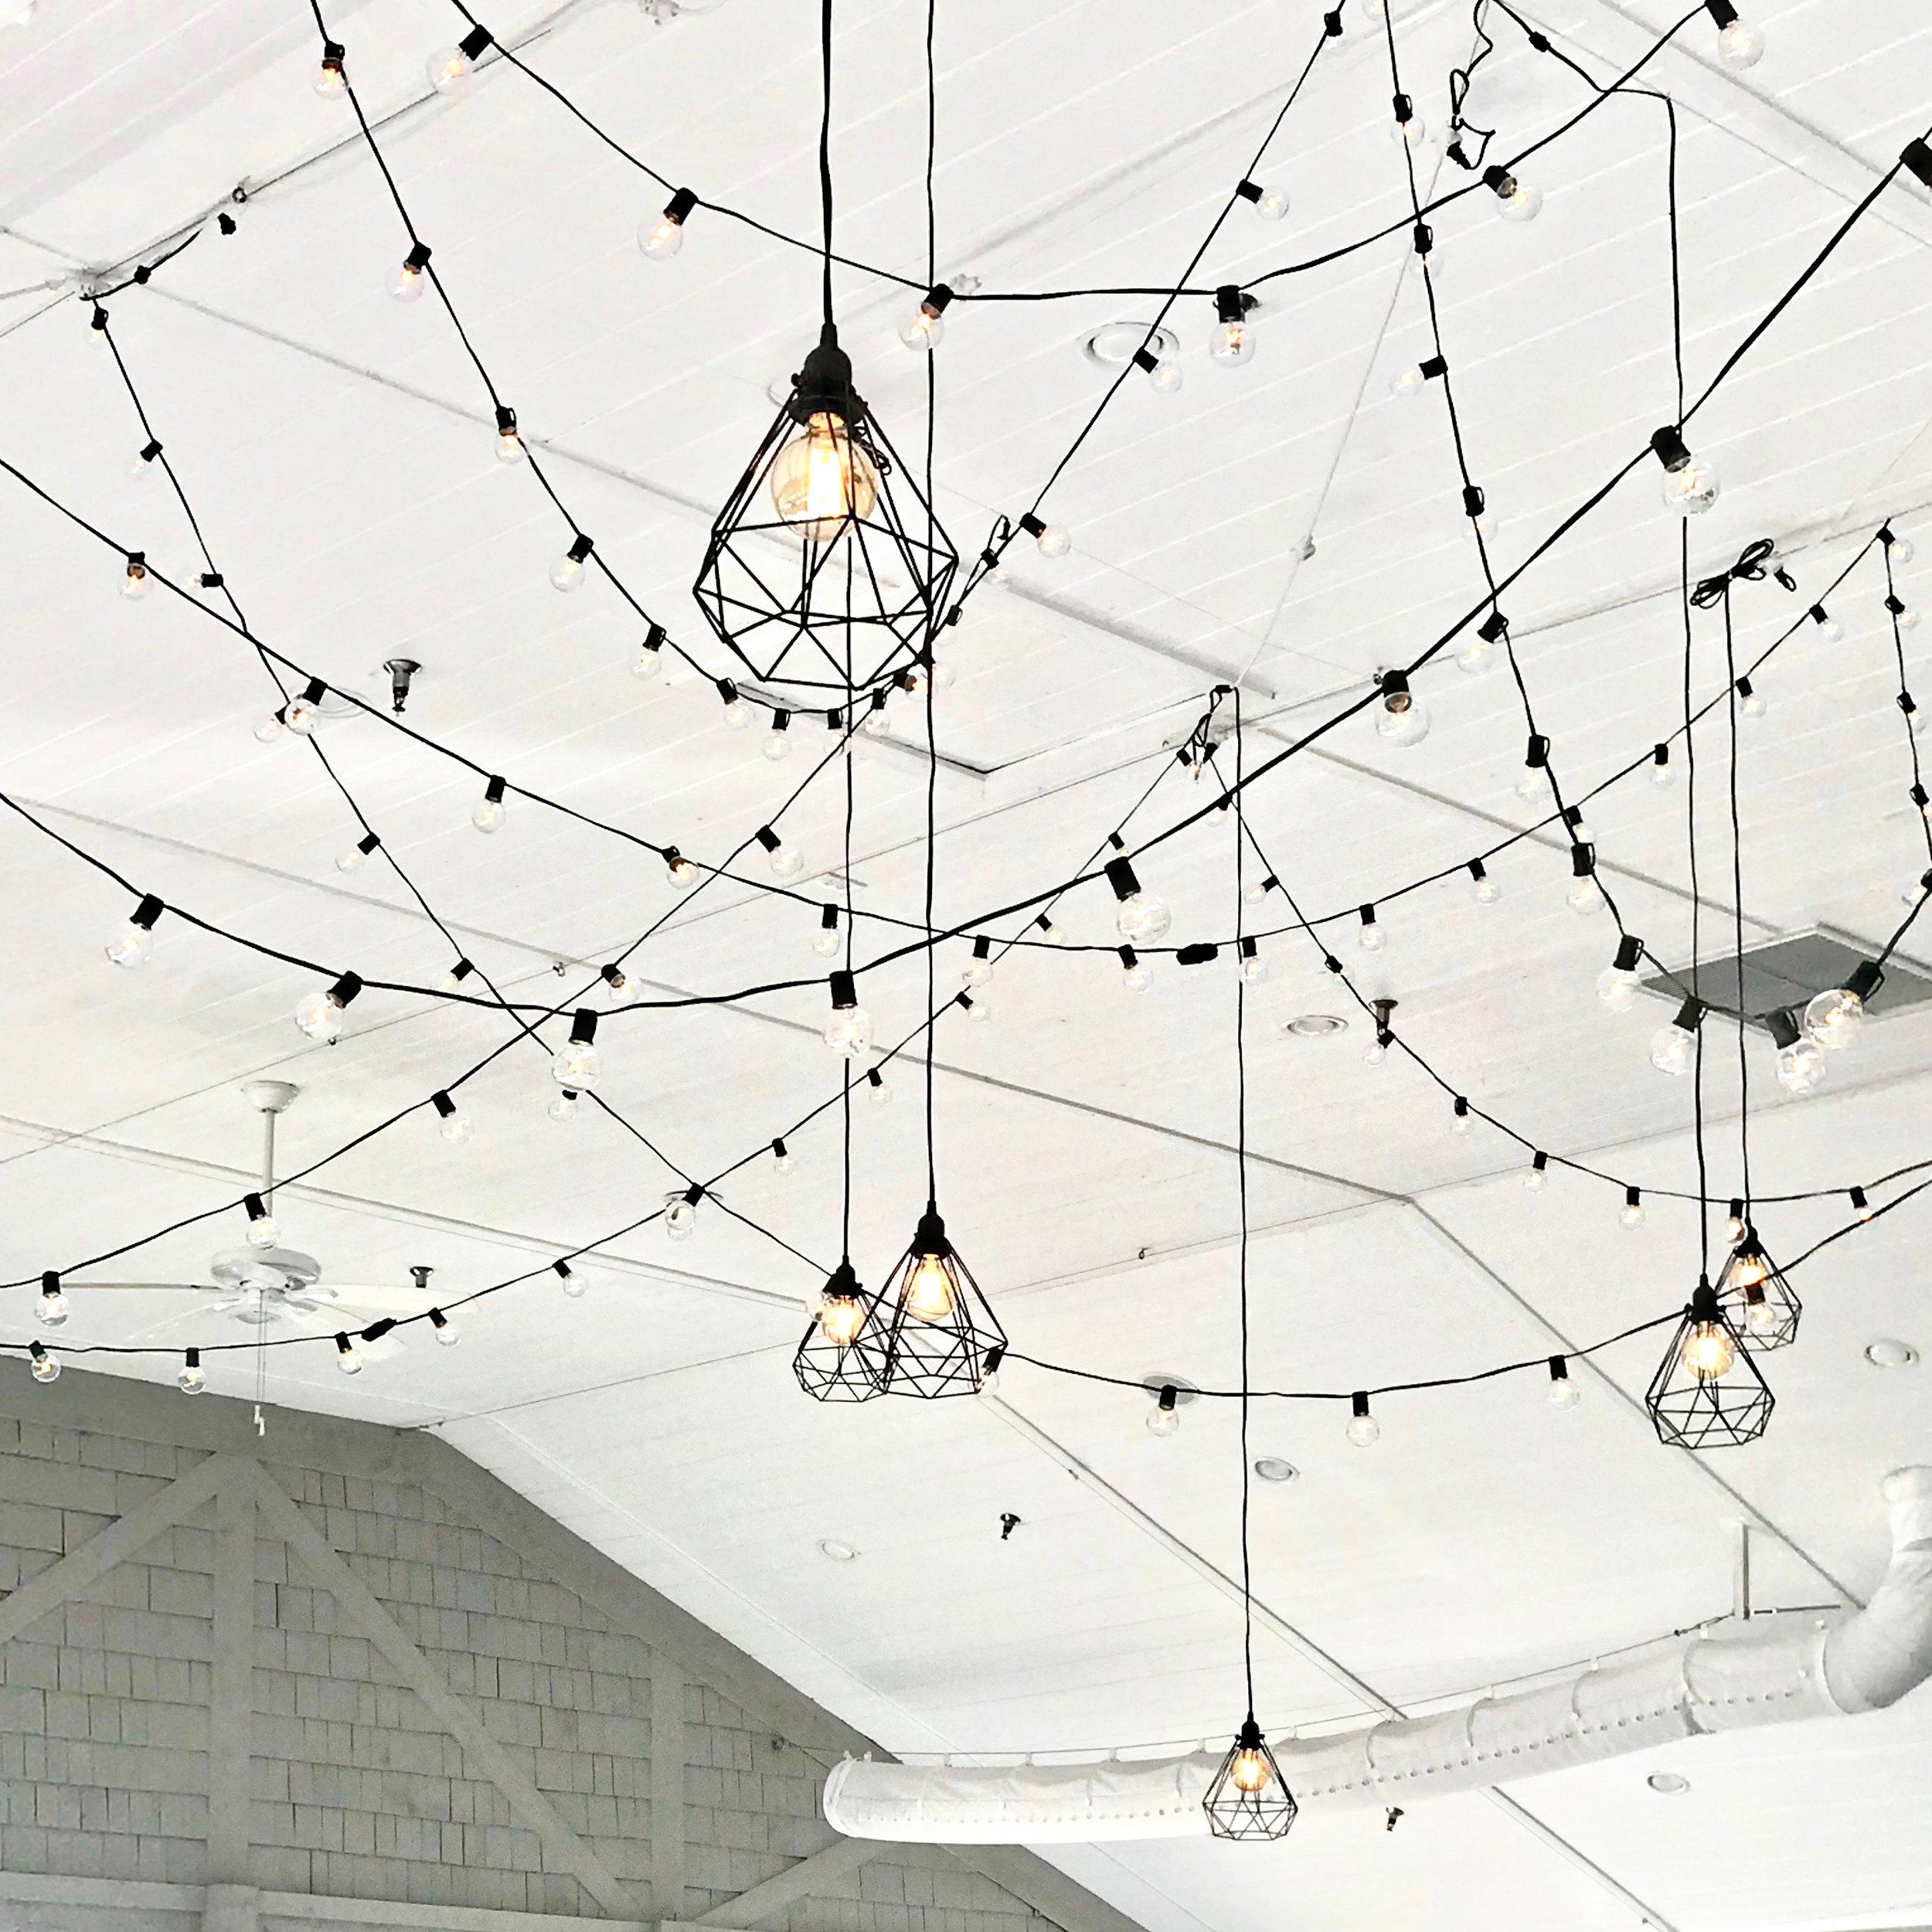 renee landry events lighting geometric cage wire form hanging wedding decor reception edison bulb boho rentals.jpg